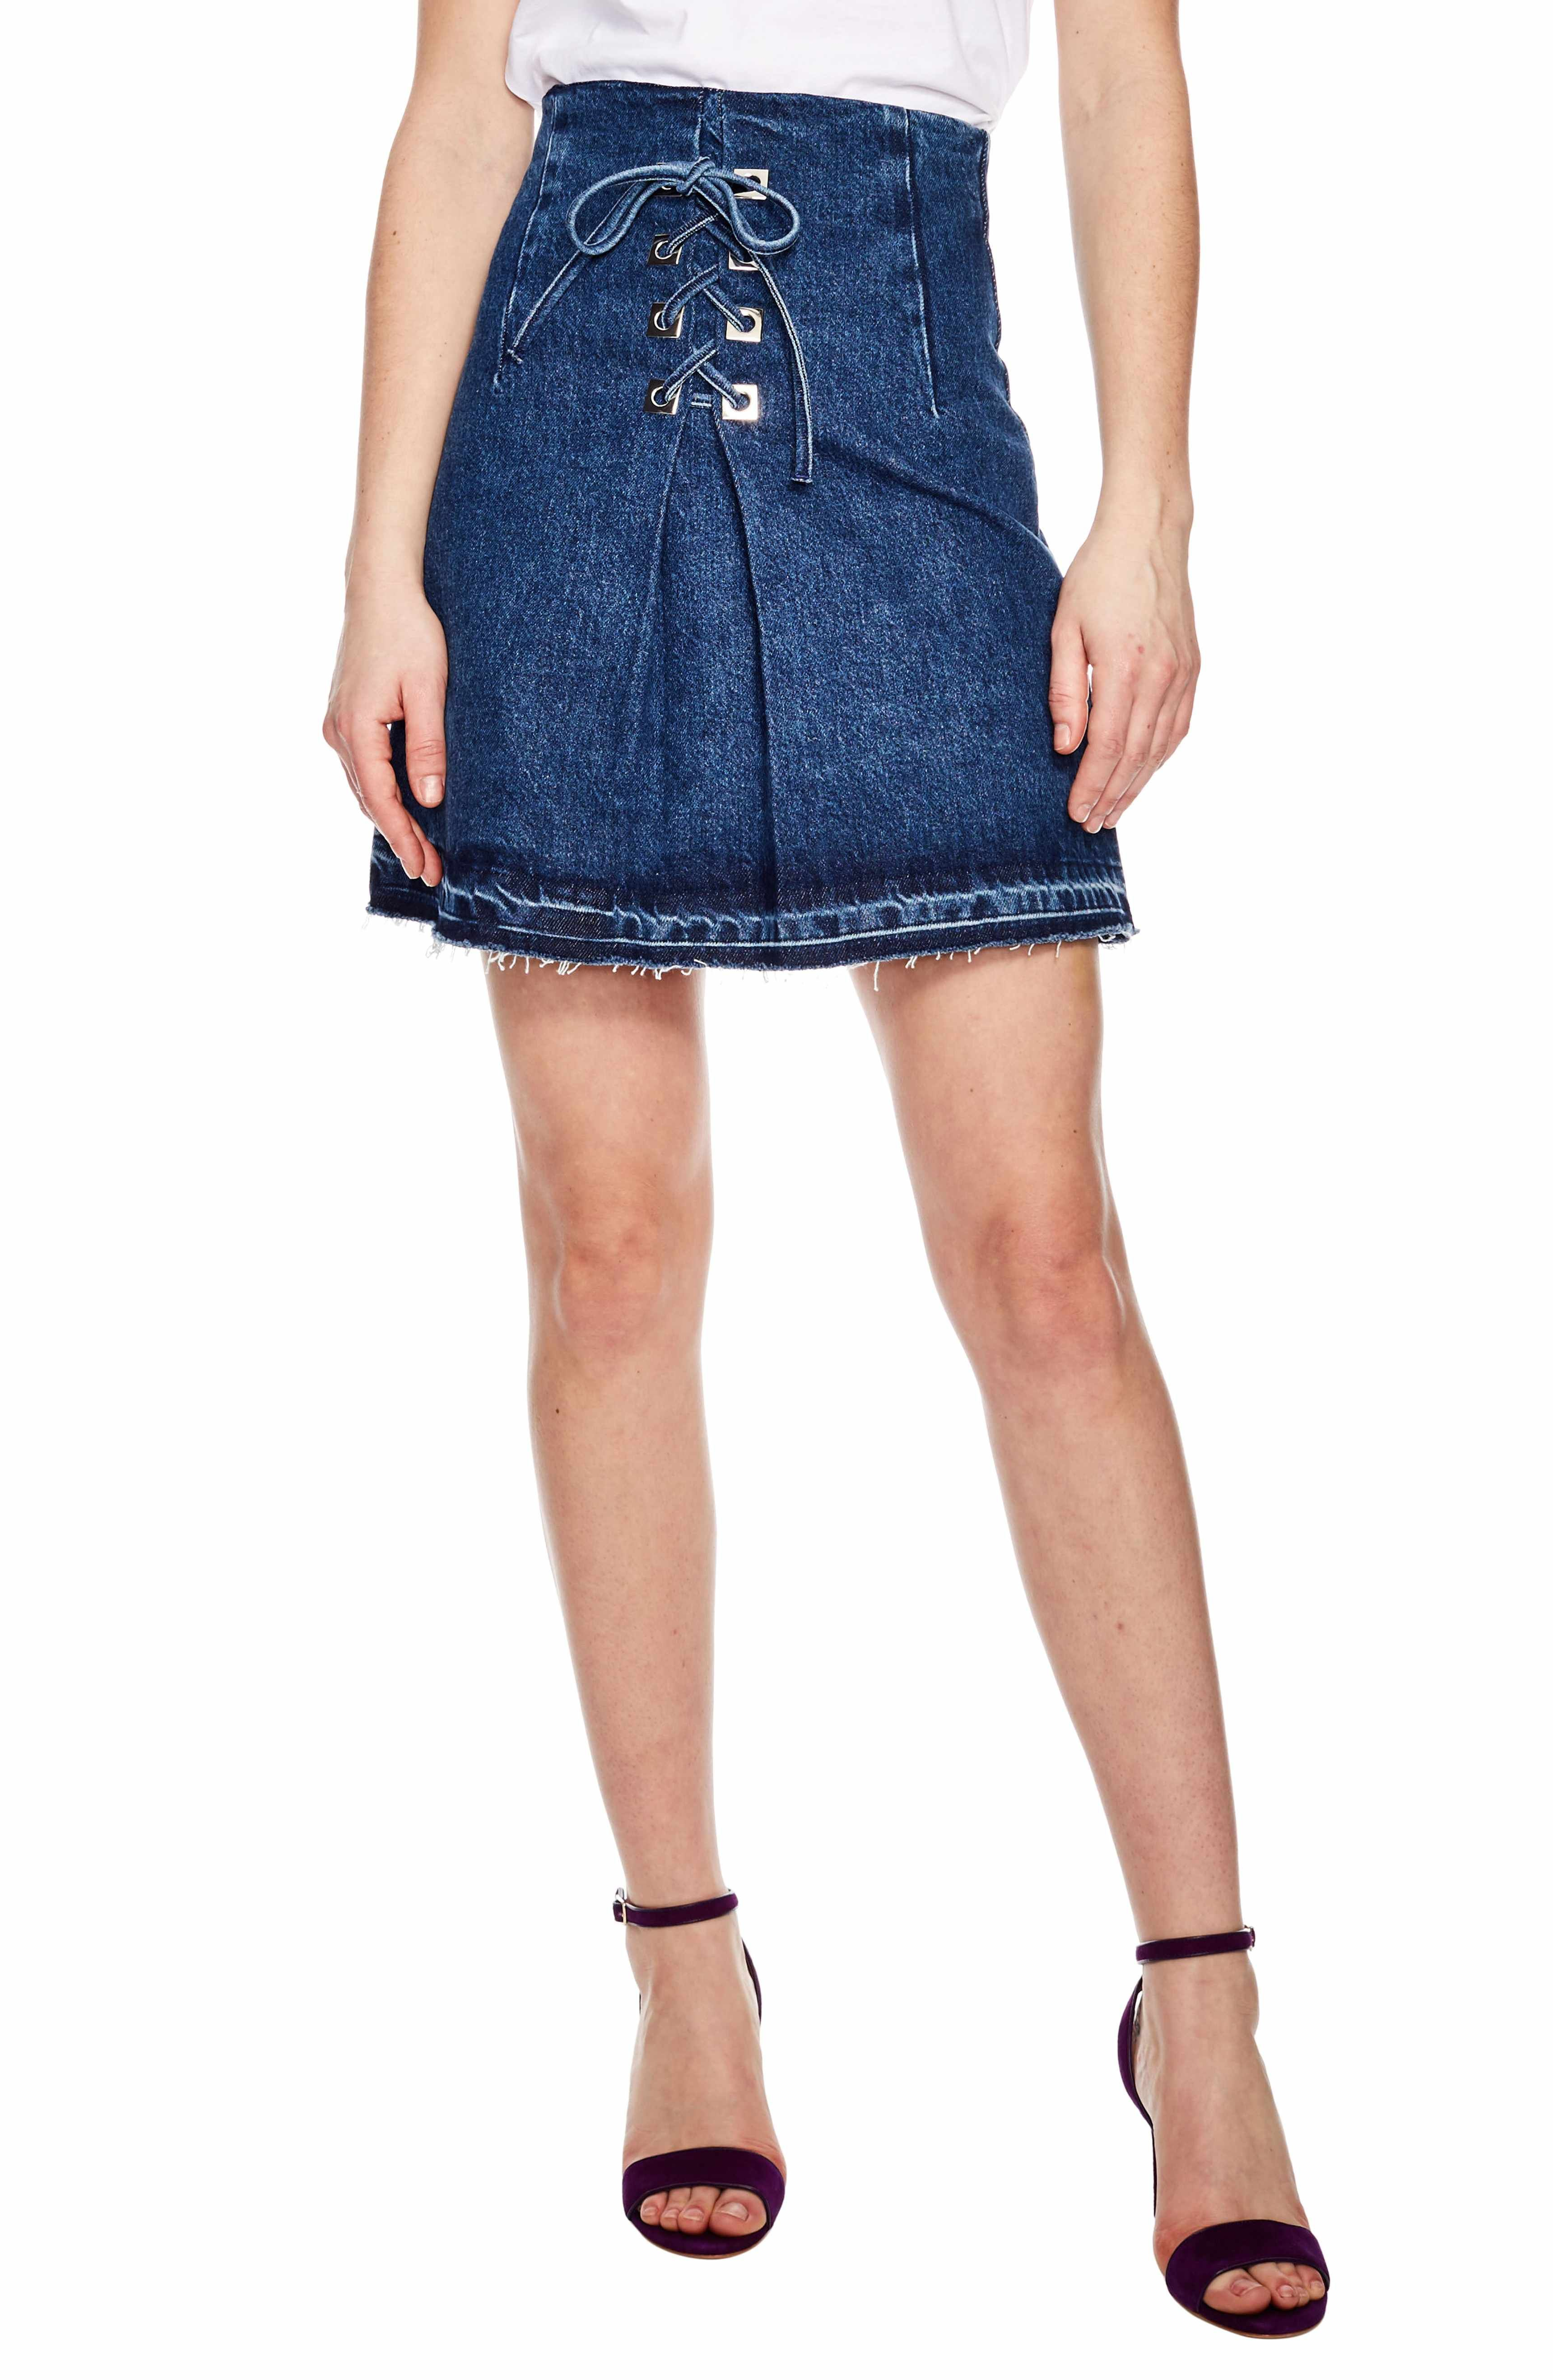 9bc7ec3914 Main Image - sandro Blue Vintage Denim Mini Skirt | Jeans in 2019